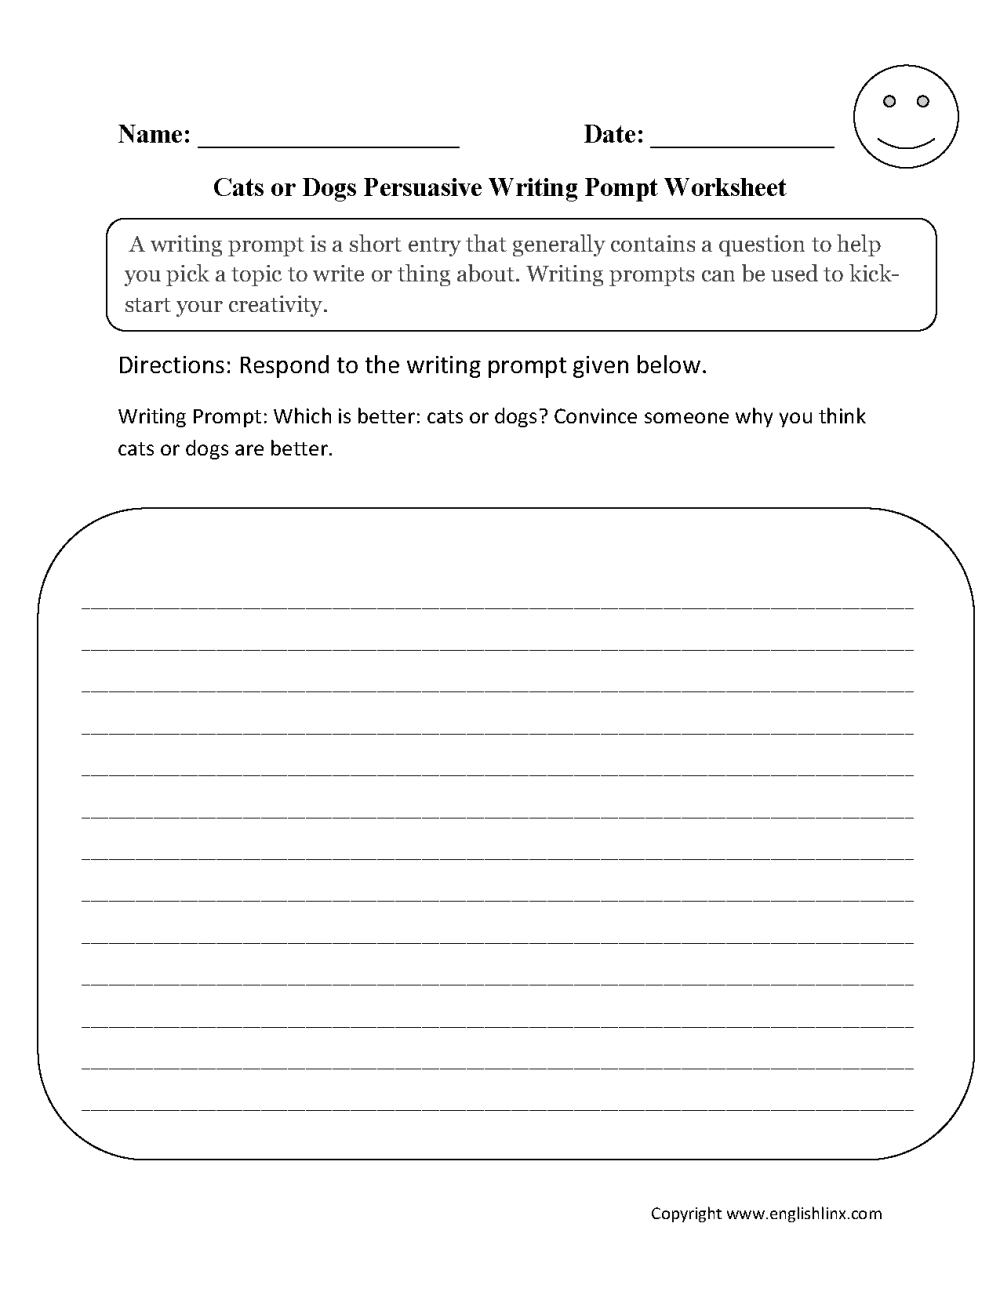 medium resolution of Writing Prompts Worksheets   Persuasive Writing Prompts Worksheets